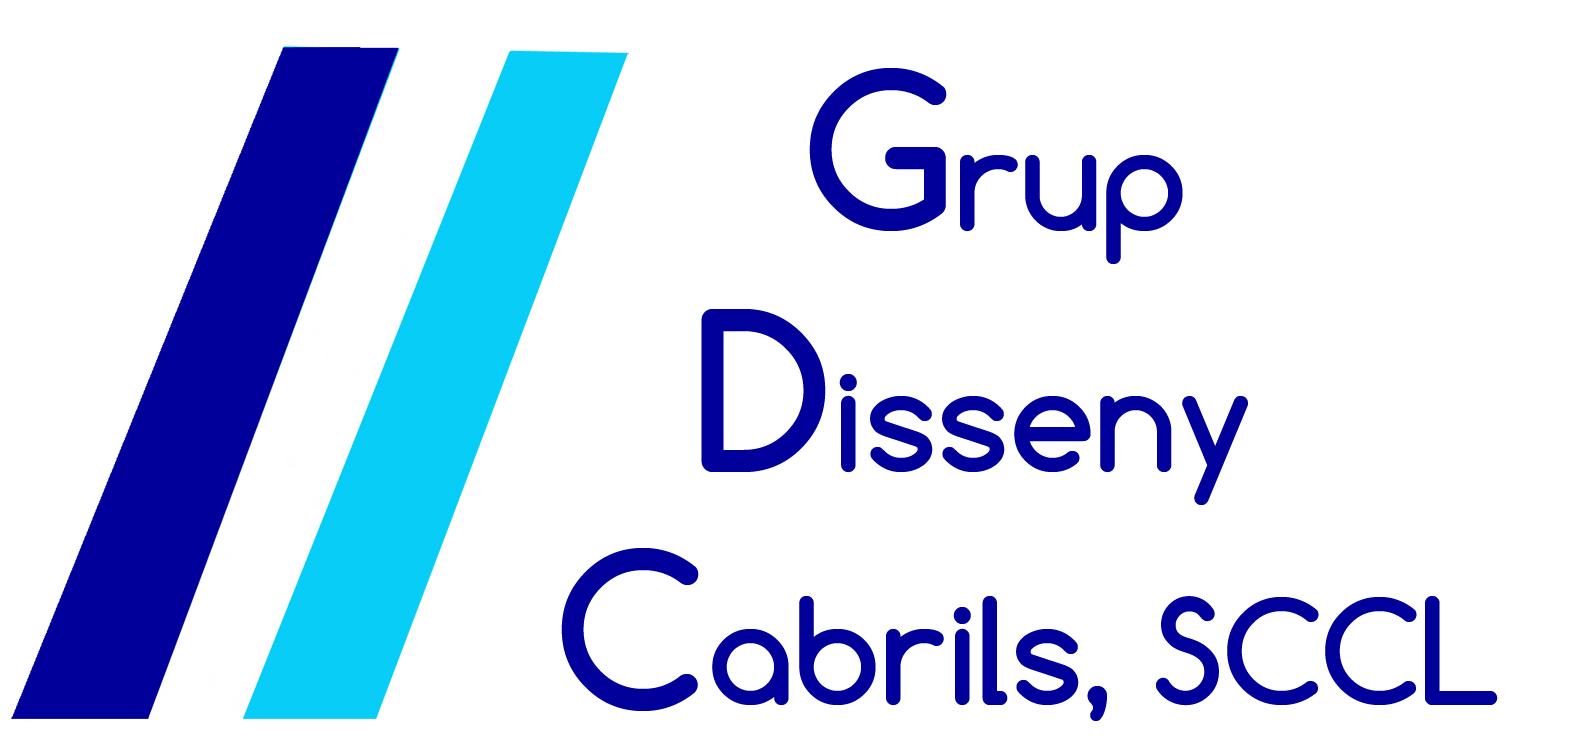 Grup Disseny cabrils, SCCL